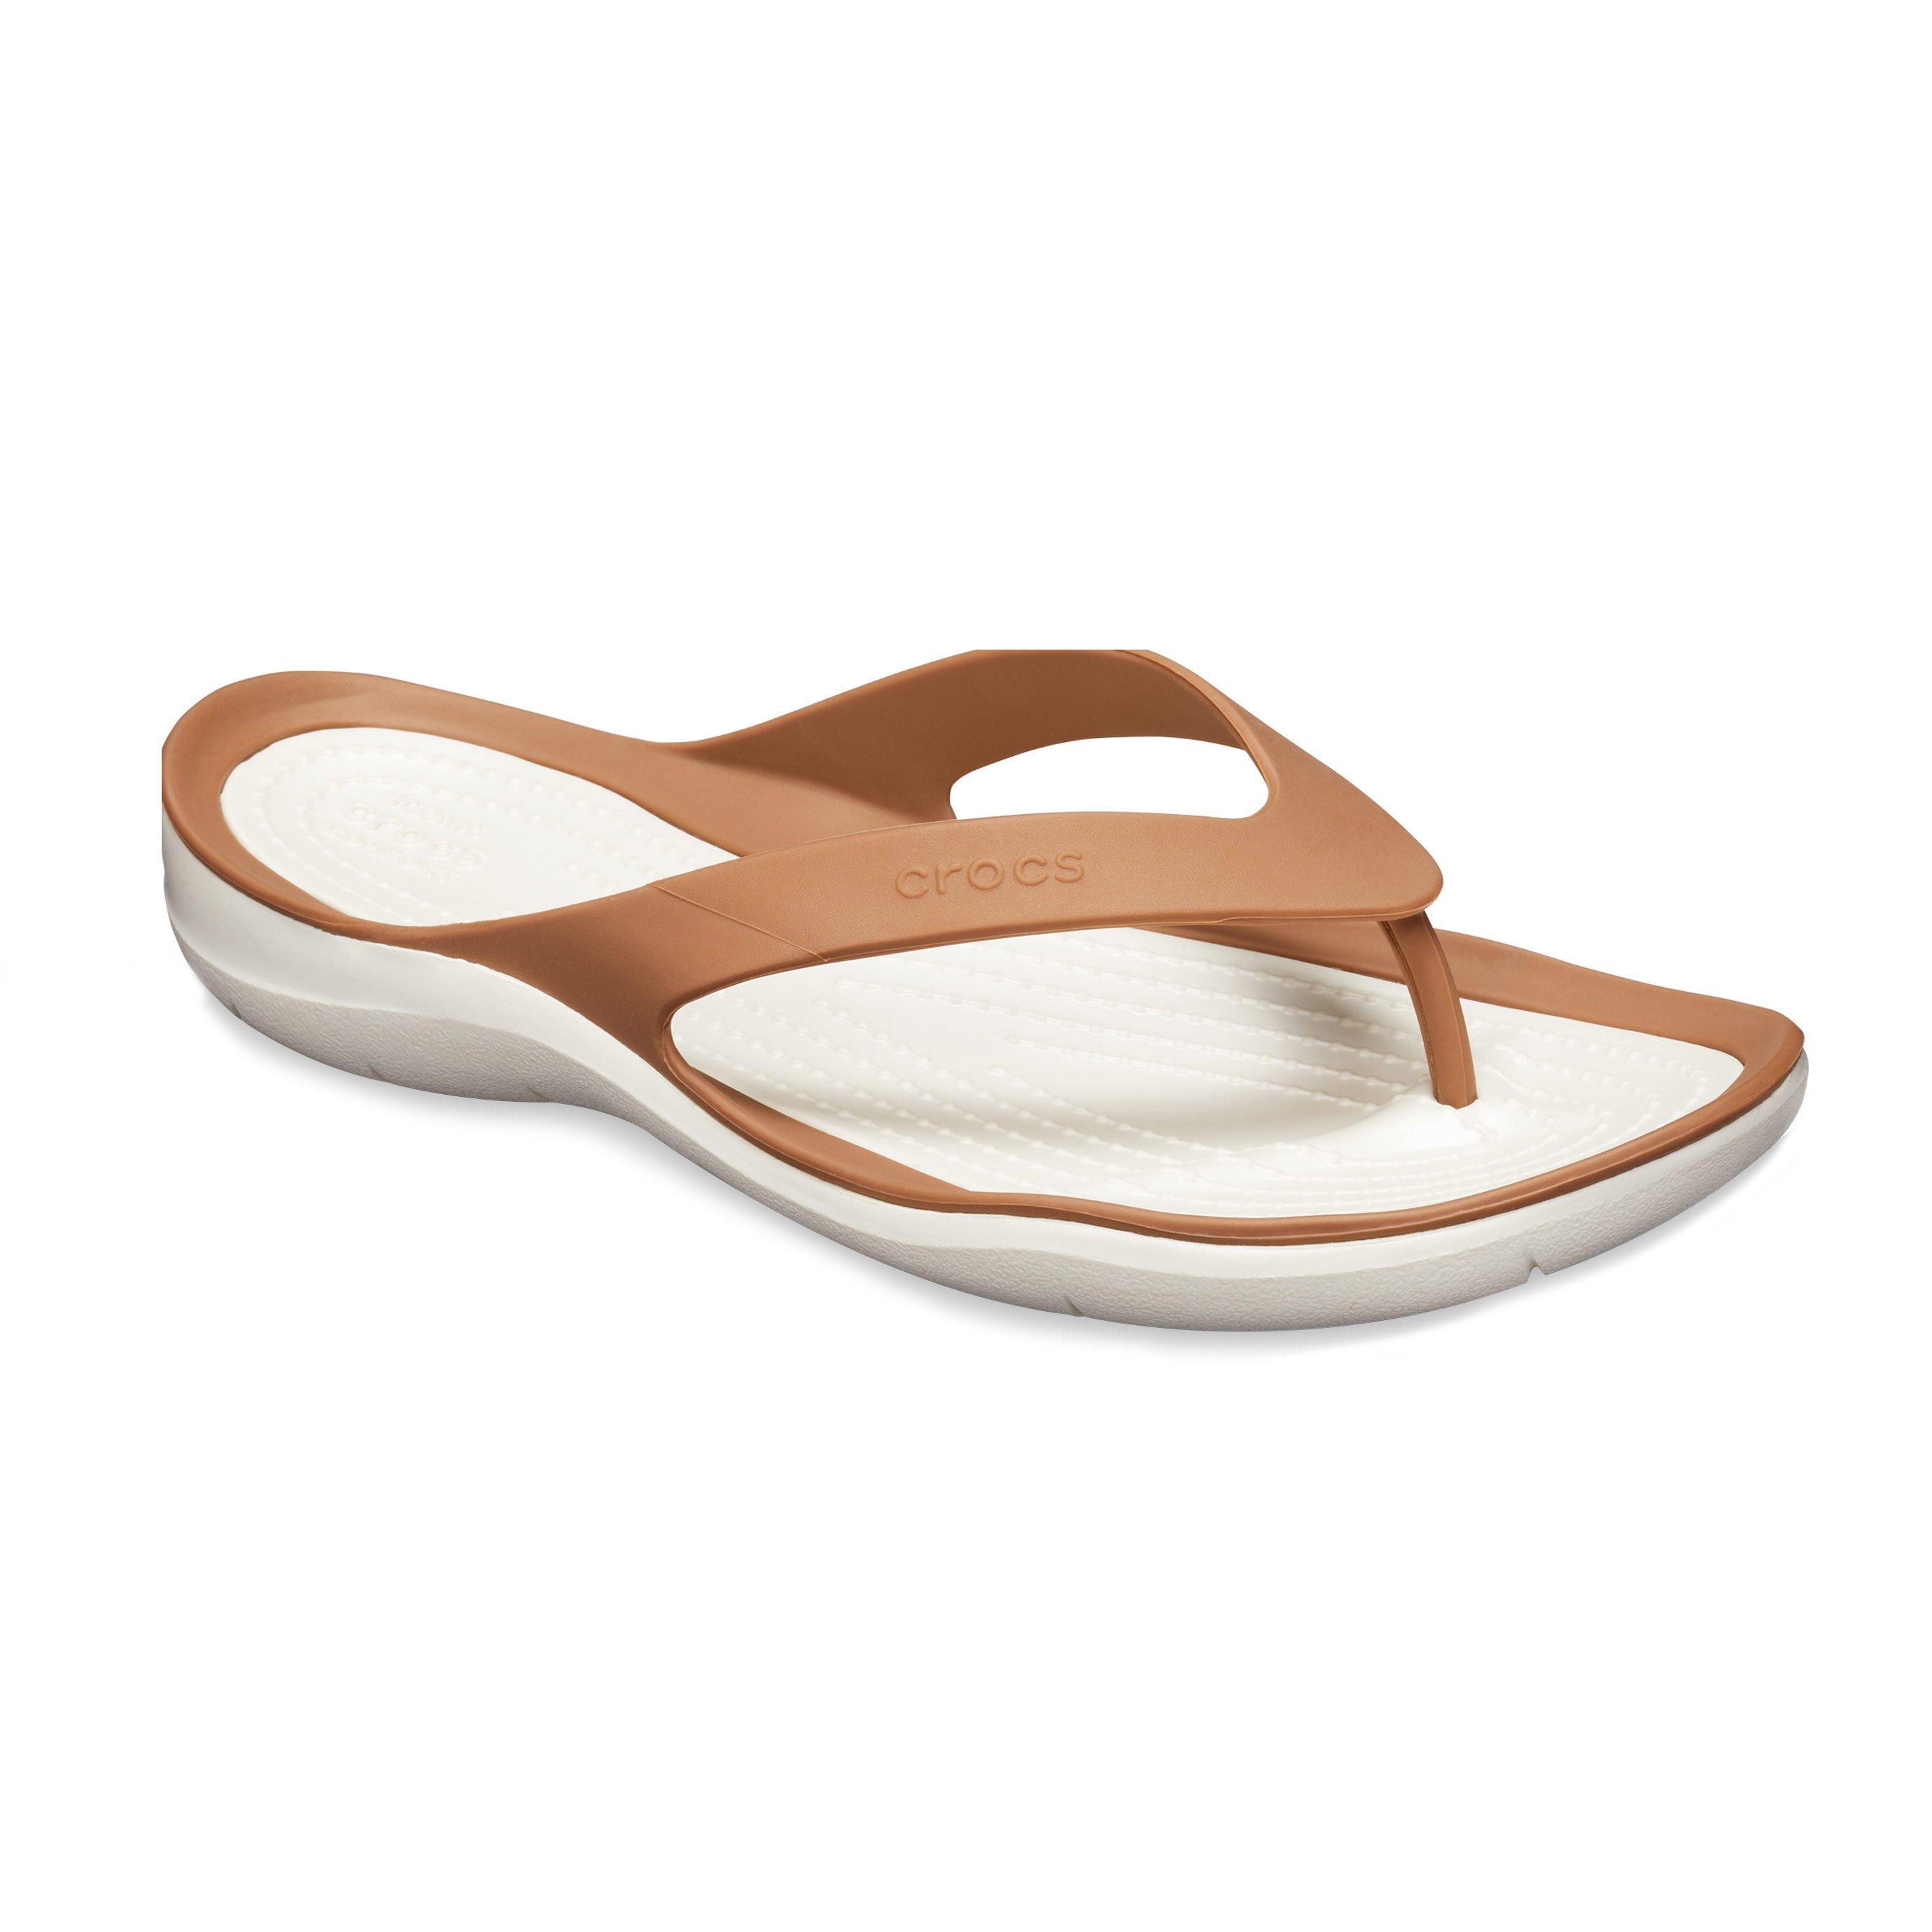 Crocs Swiftwater Flip - נעלי אצבע קרוקס לנשים בצבע ברונזה